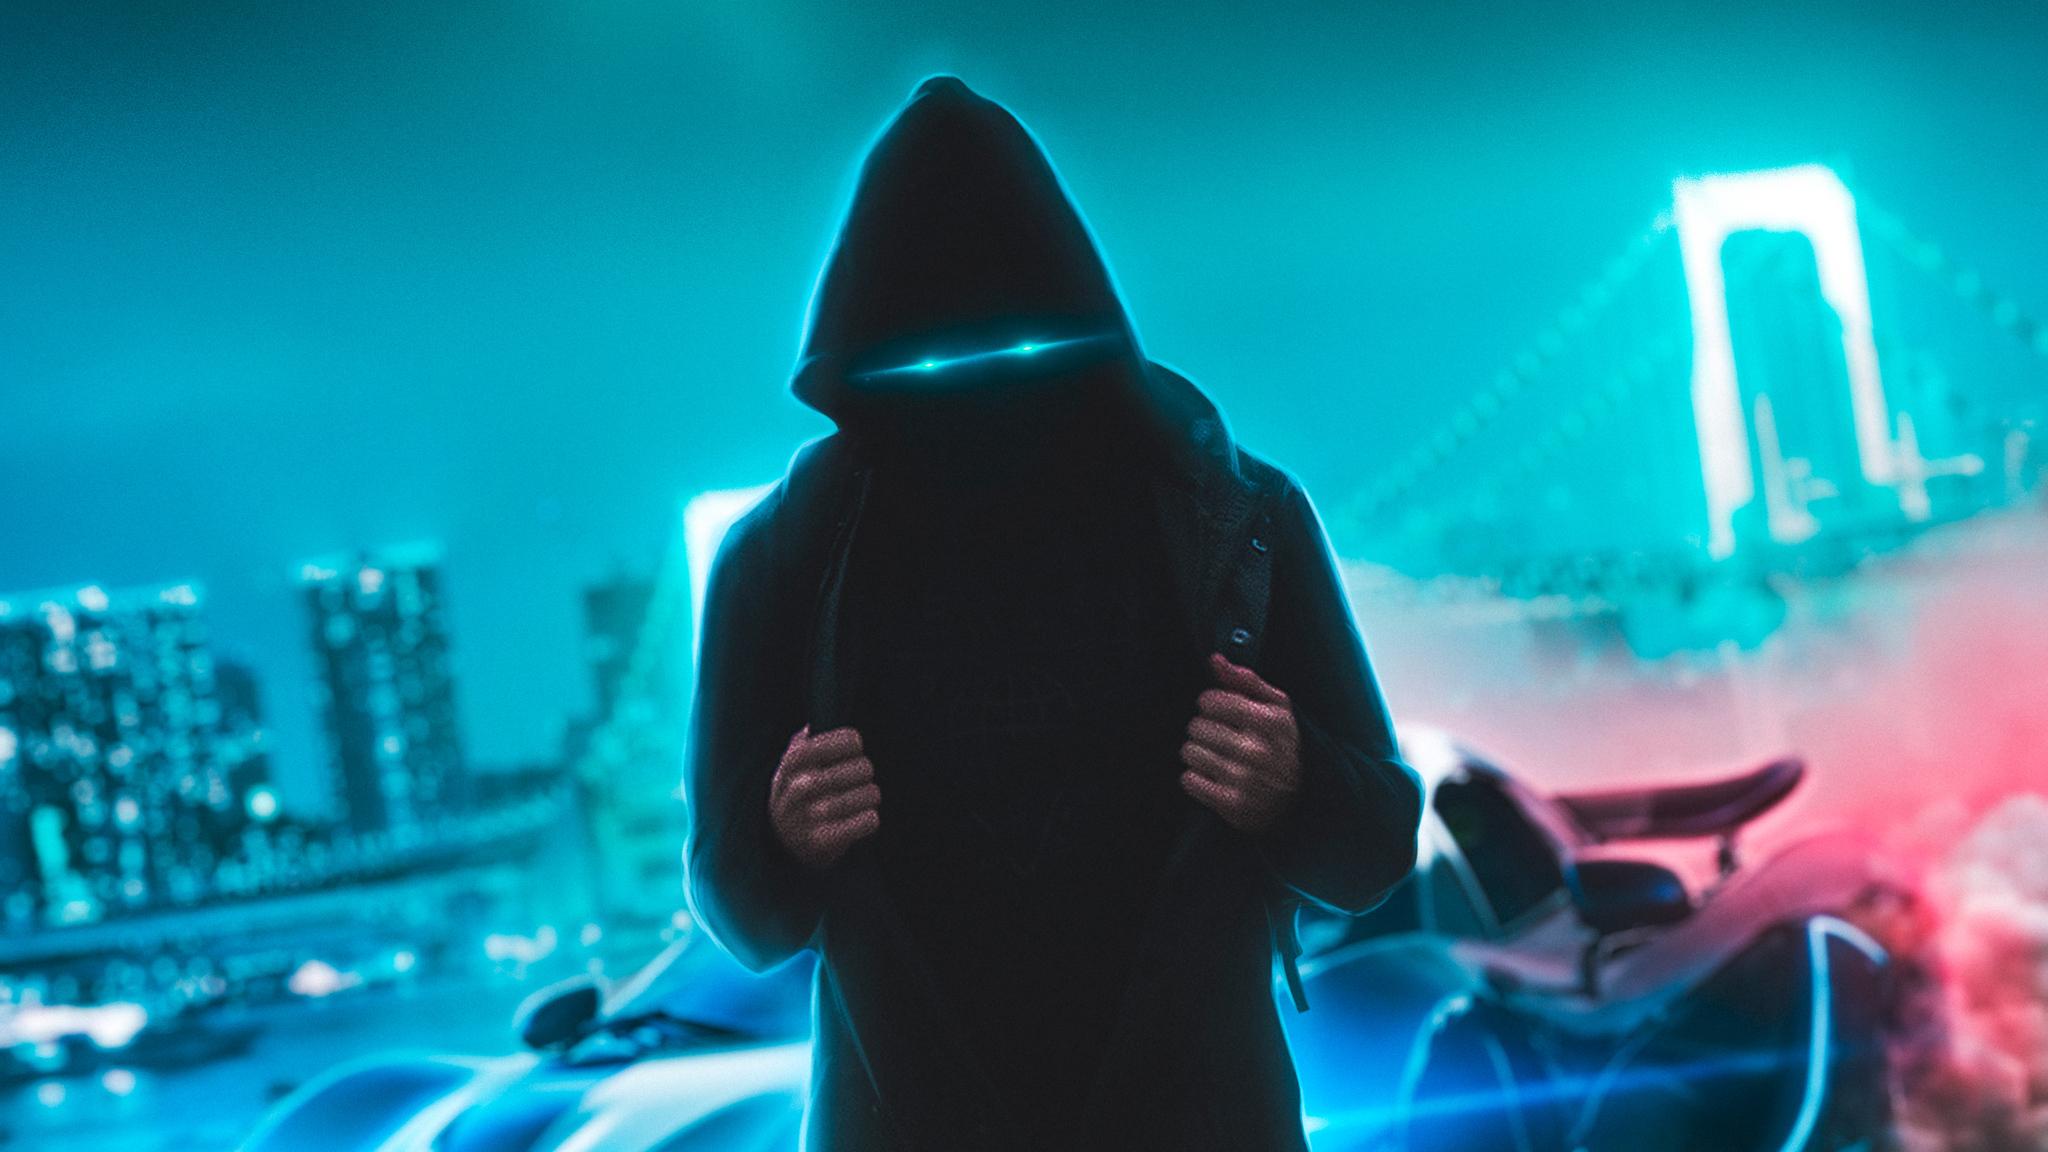 2048x1152 Neon Eyes Hoodie Guy With Sport Car 2048x1152